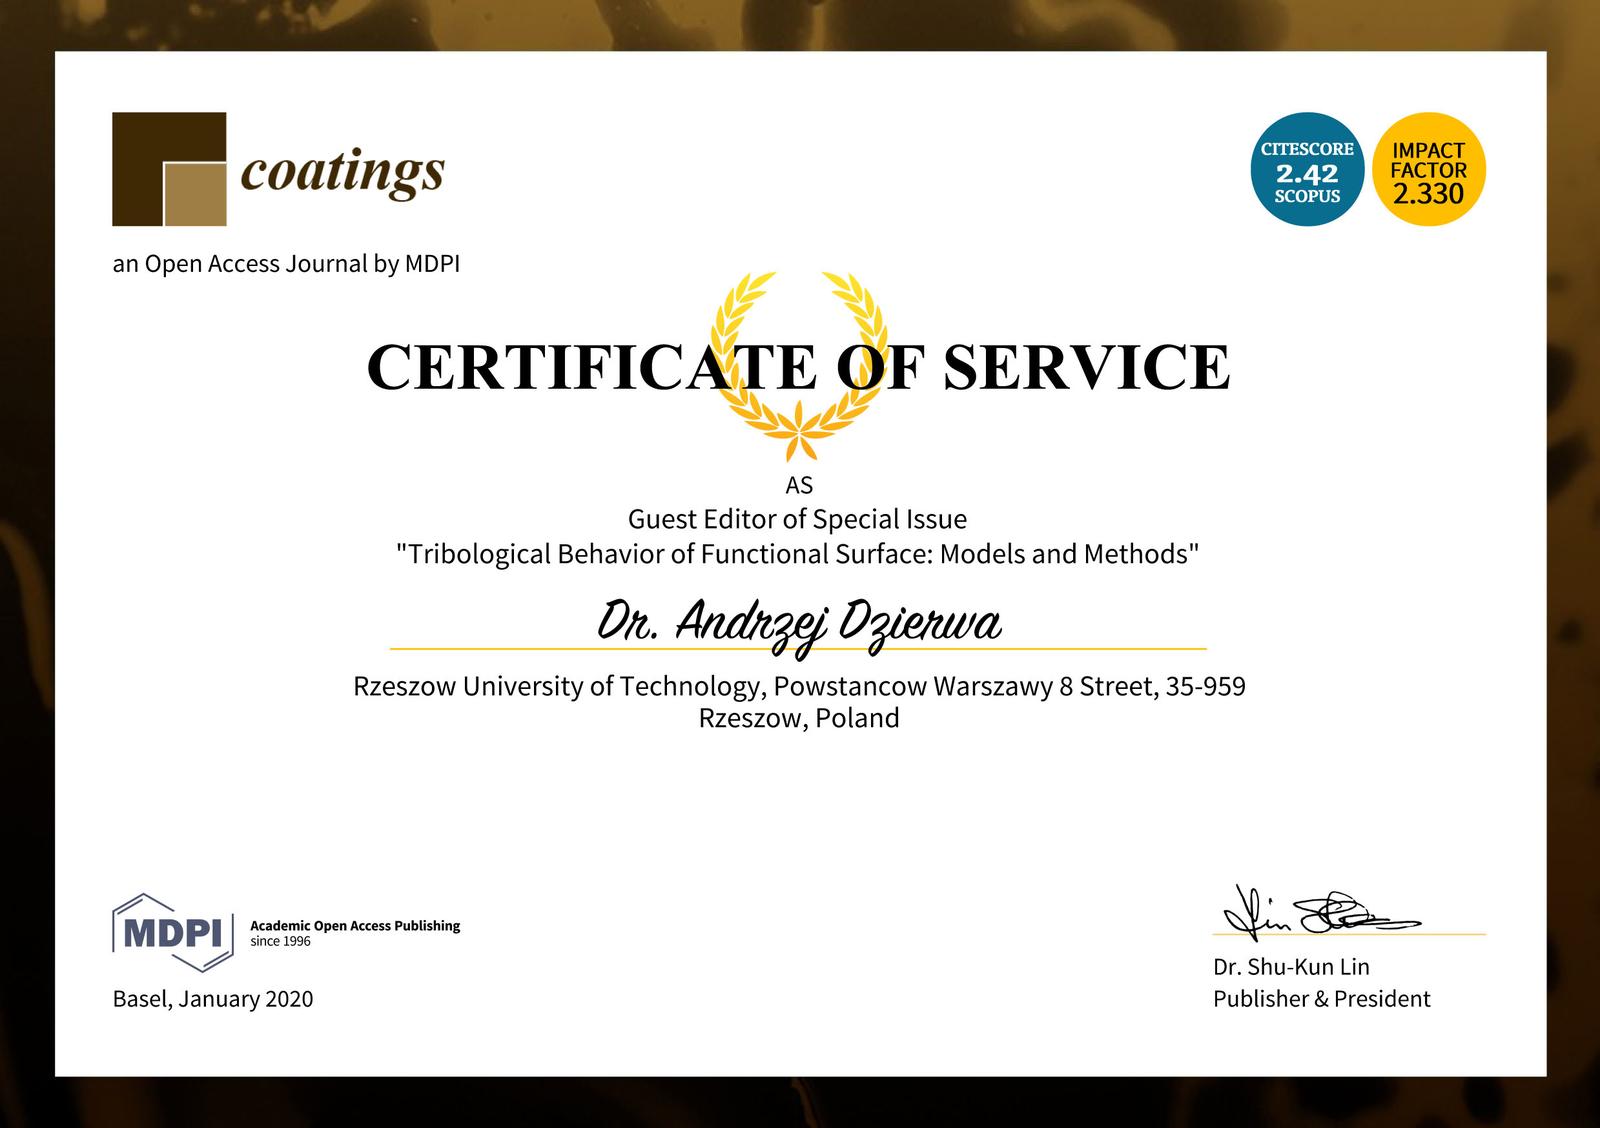 editor-certificate-79896.jpg